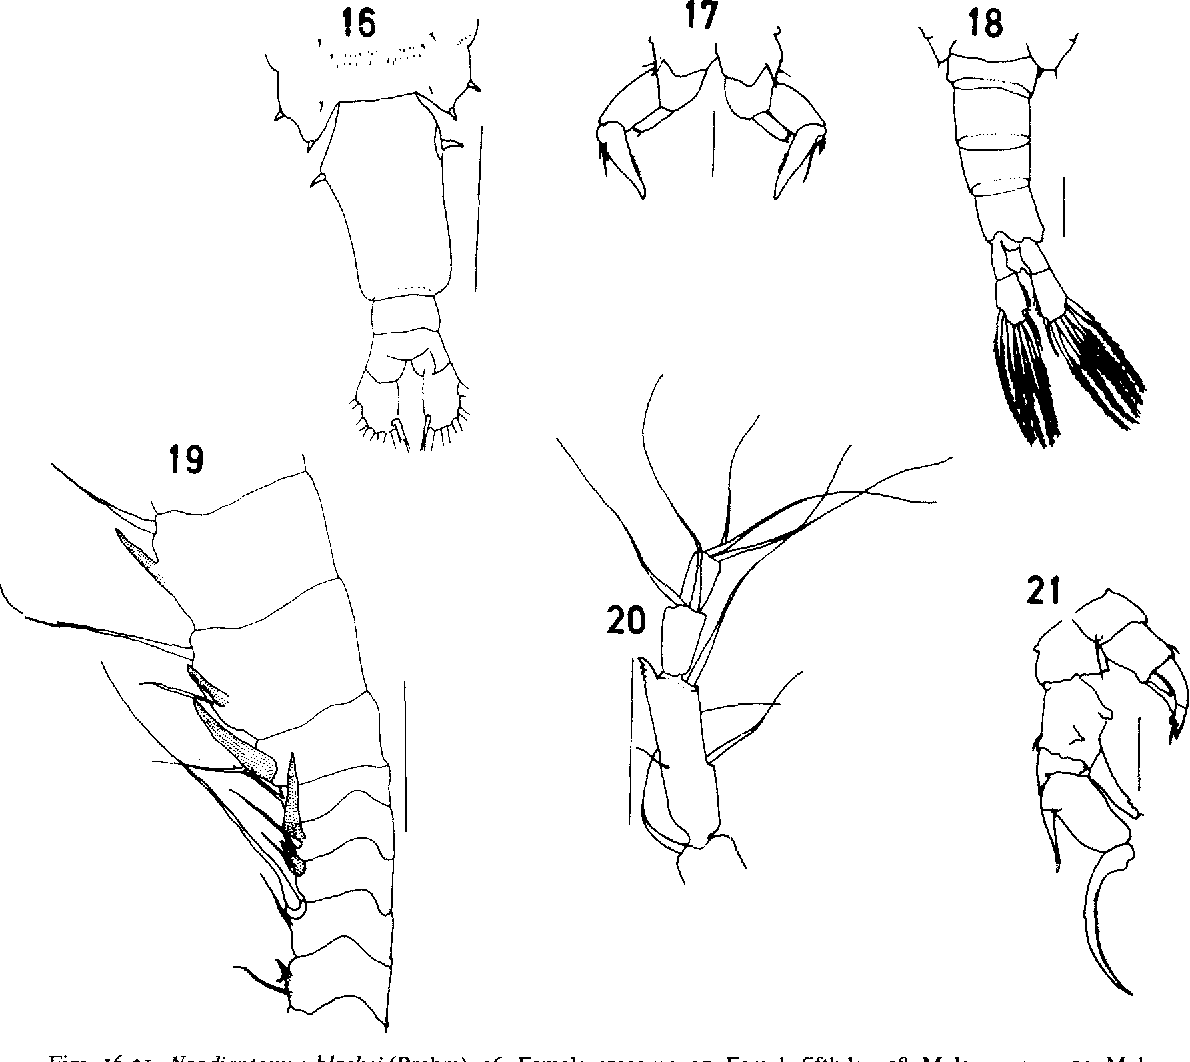 figure 16-21